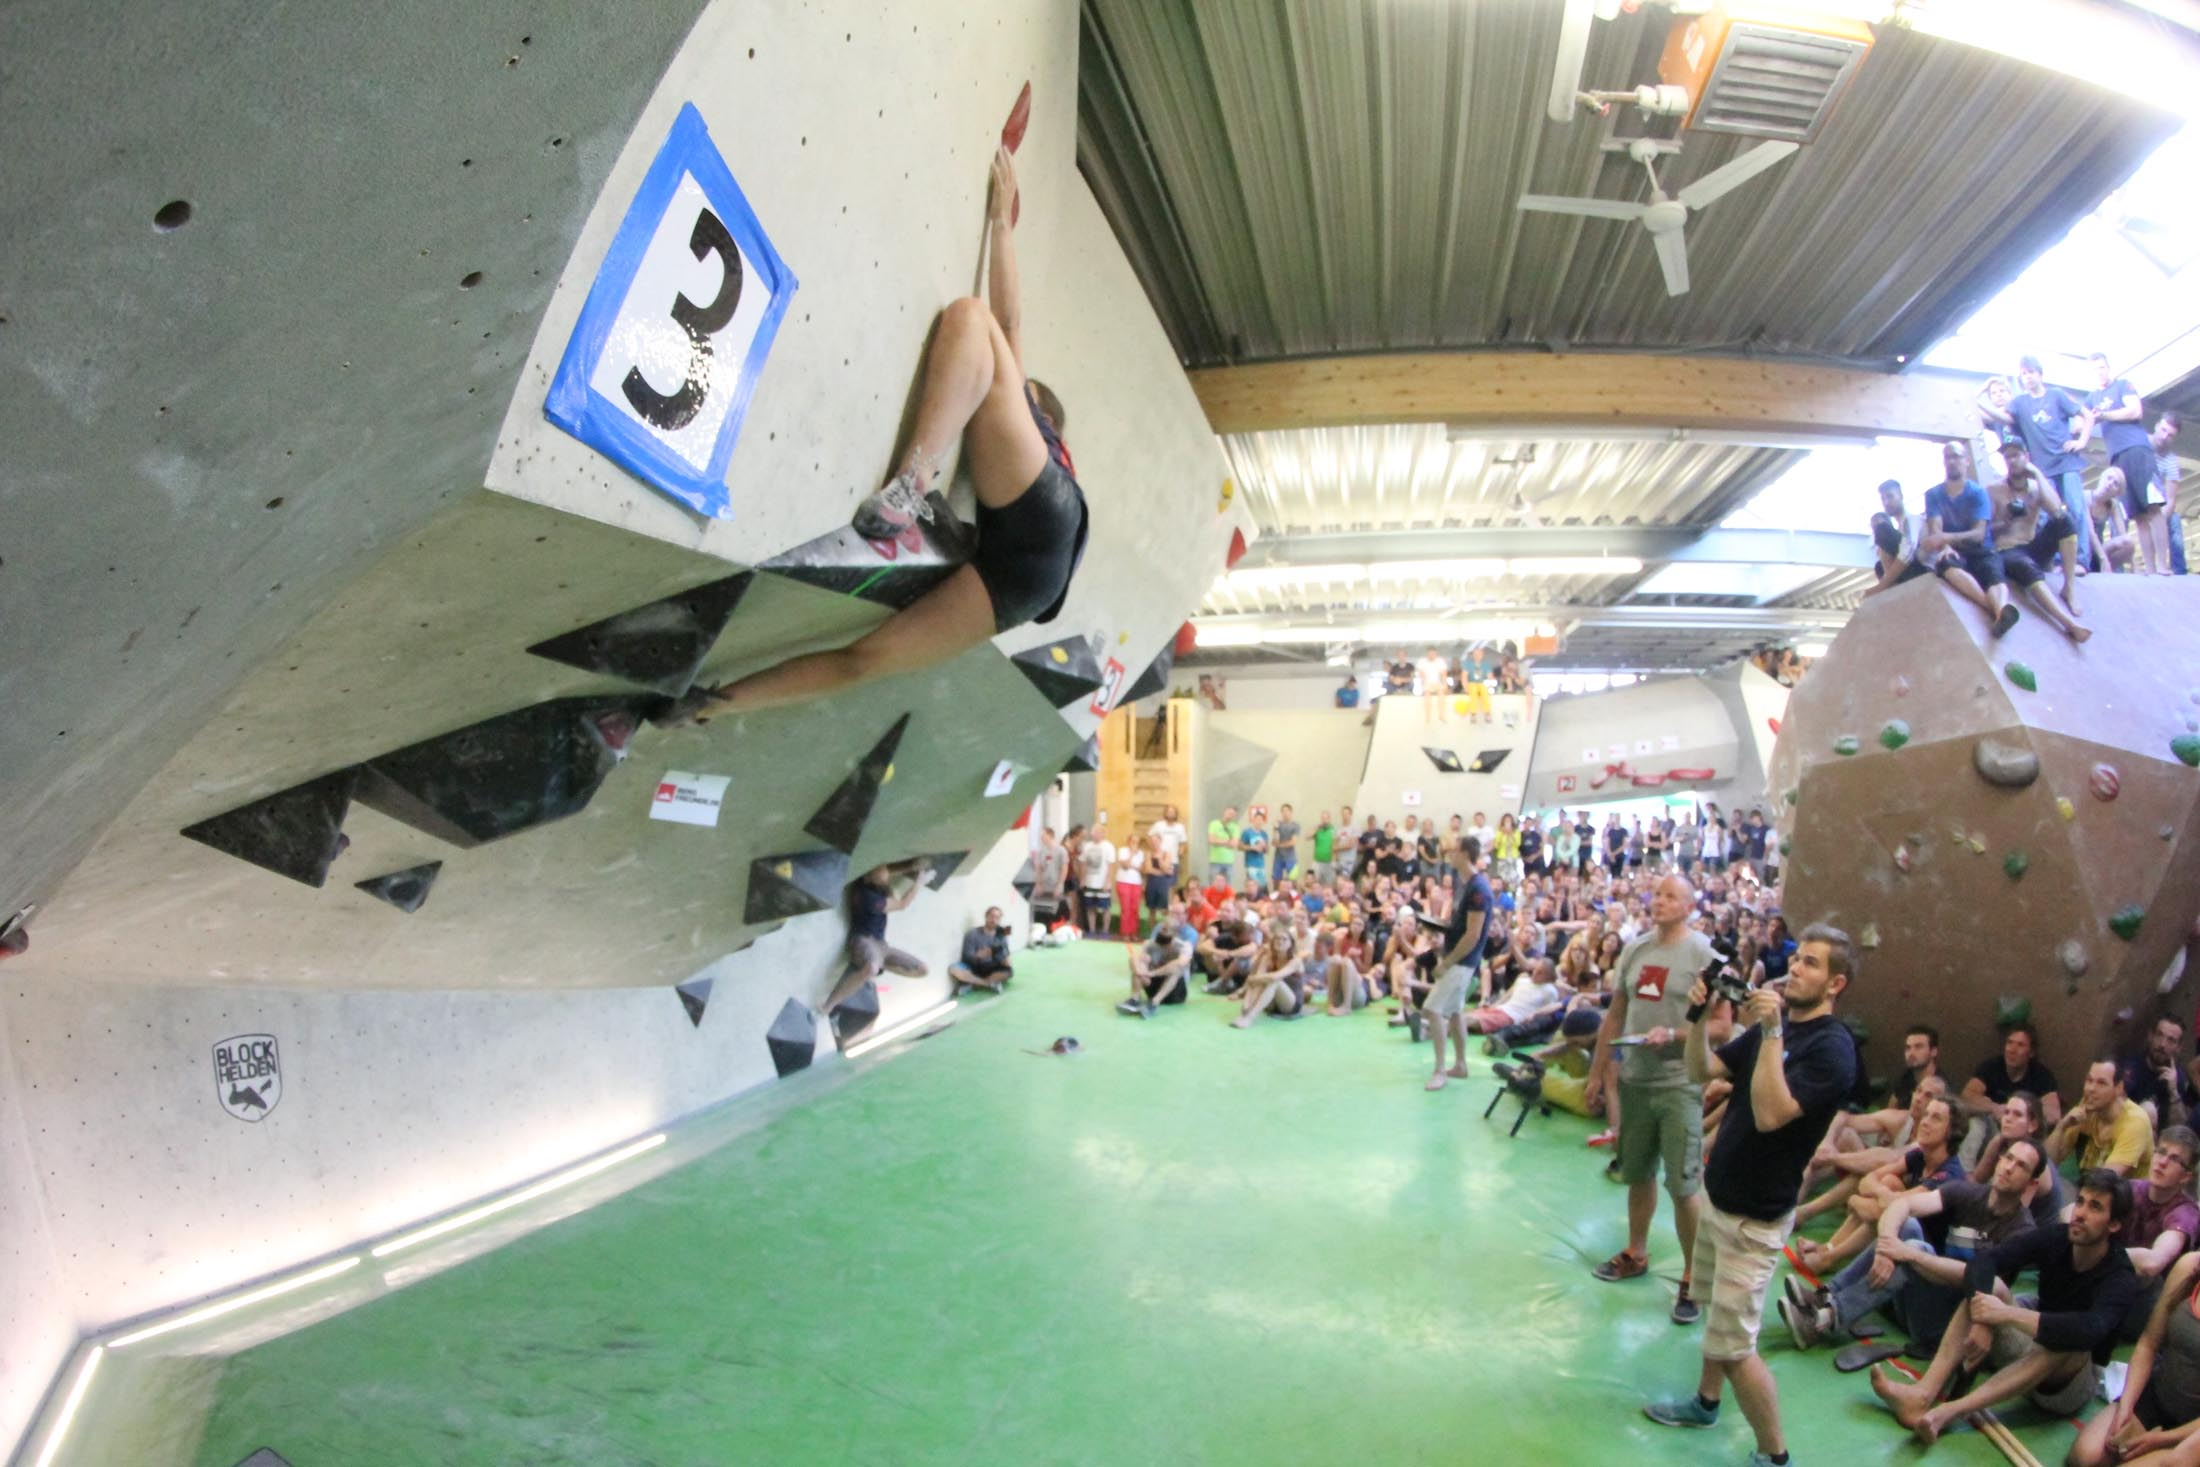 Finale, internationaler bouldercup Frankenjura 2016, BLOCKHELDEN Erlangen, Mammut, Bergfreunde.de, Boulderwettkampf07092016672